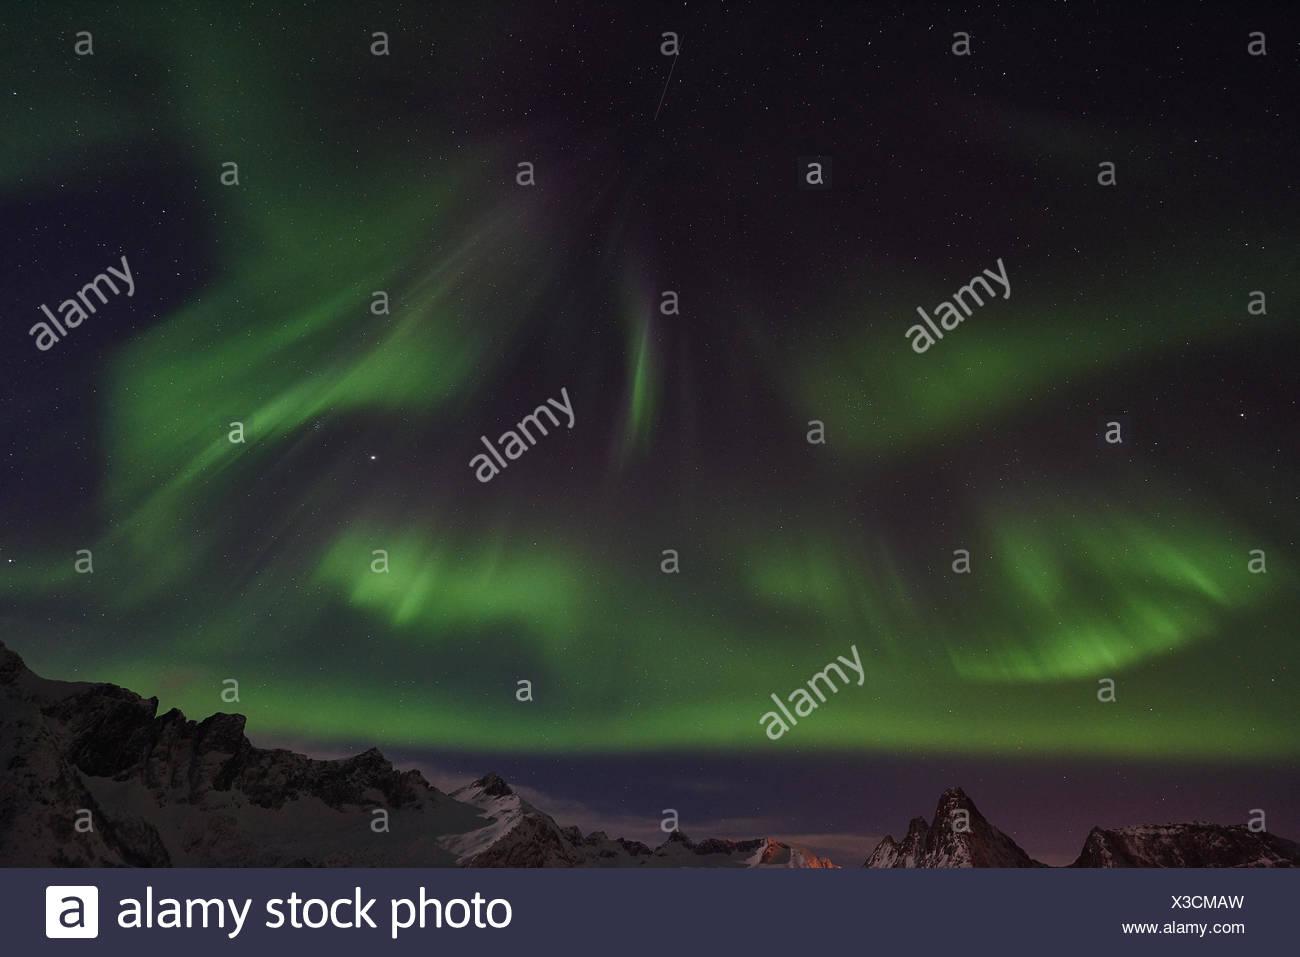 Northern lights (Aurora borealis), Senja, Norway - Stock Image